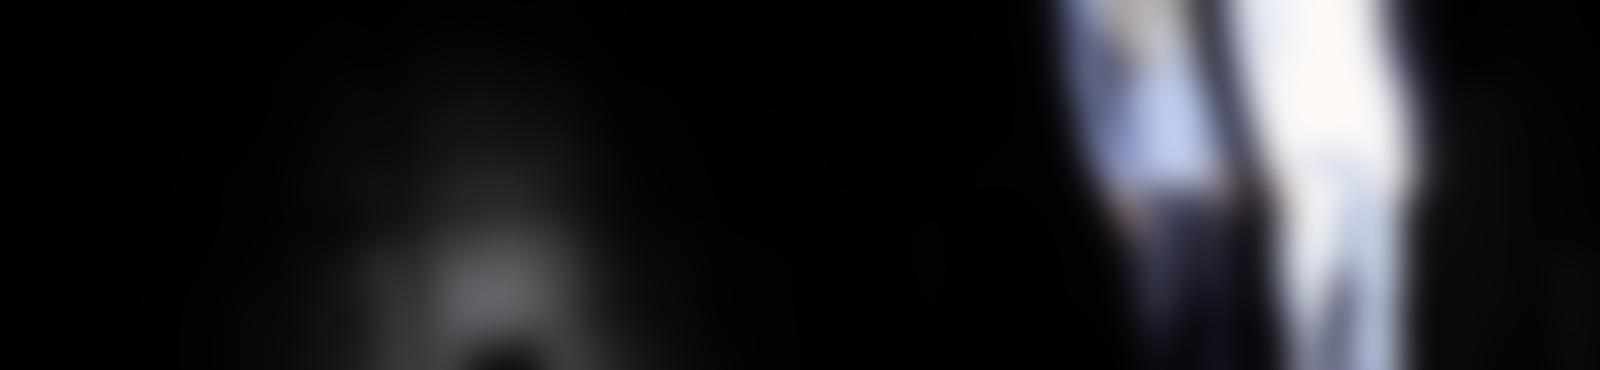 Blurred 52dea435 bfc8 4b9d b78e e46605b68a4b